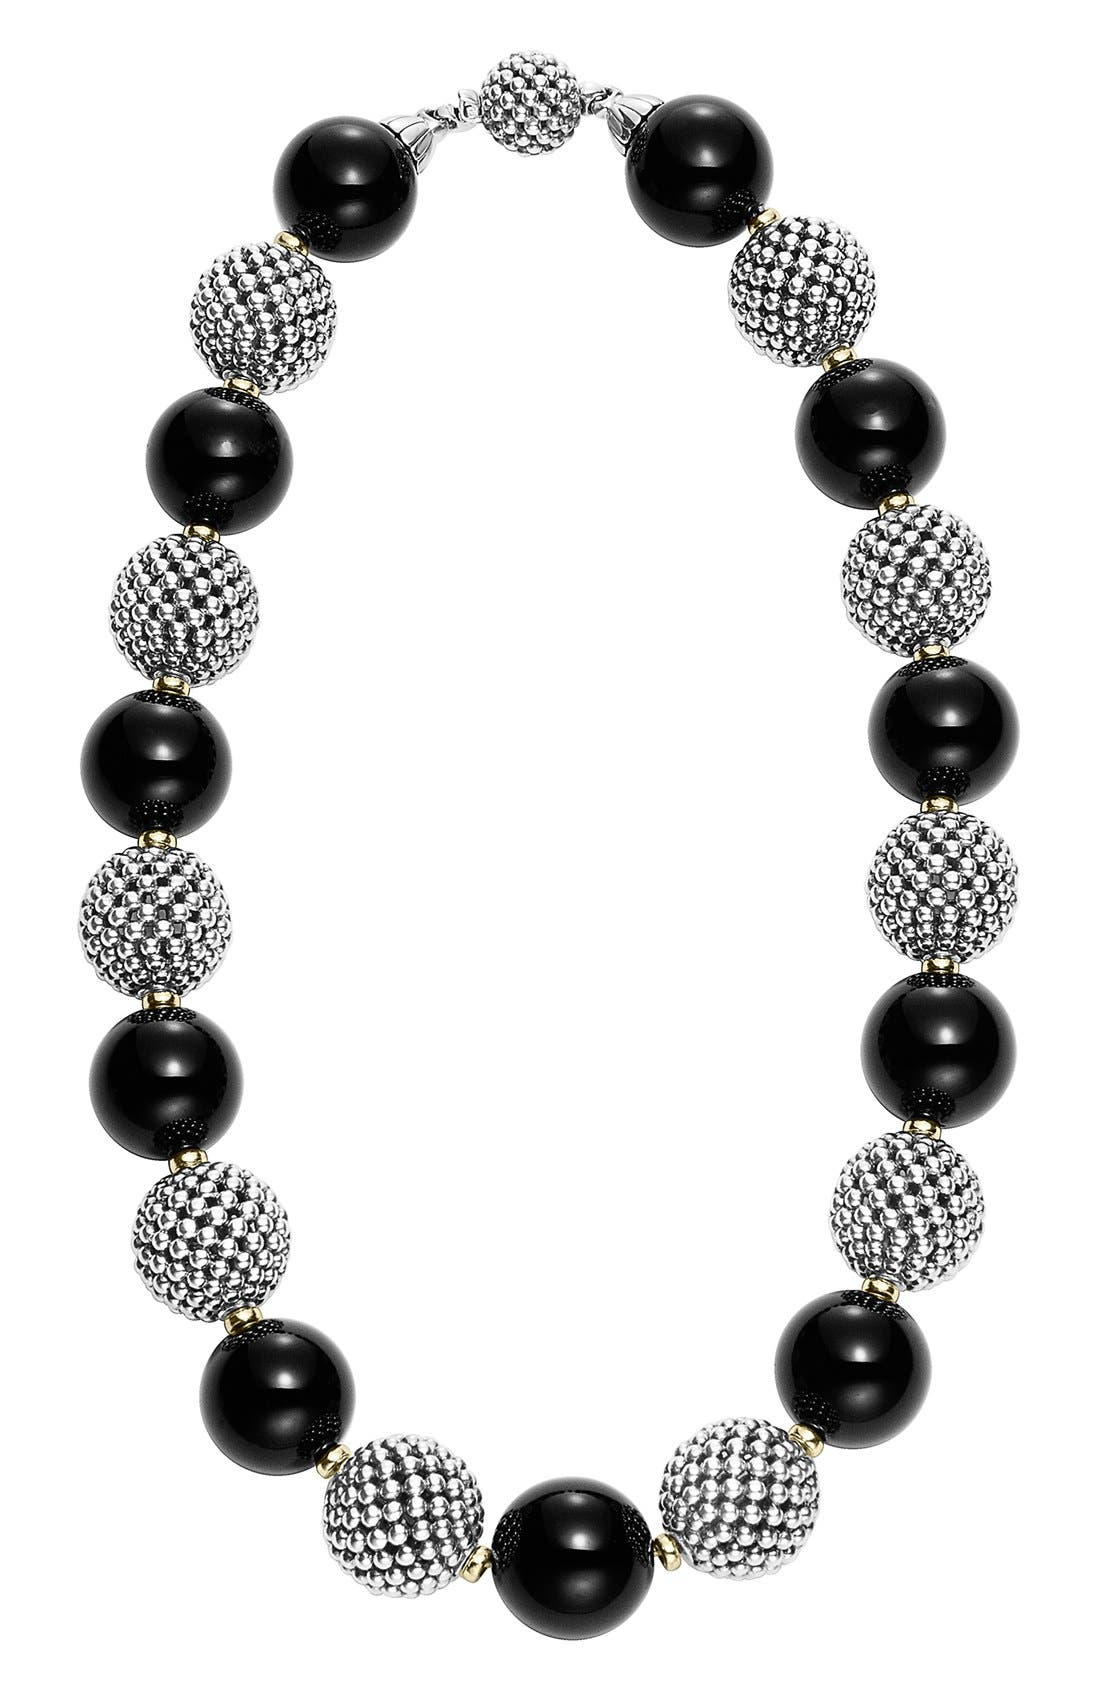 LAGOS 'Black Caviar' Beaded Necklace